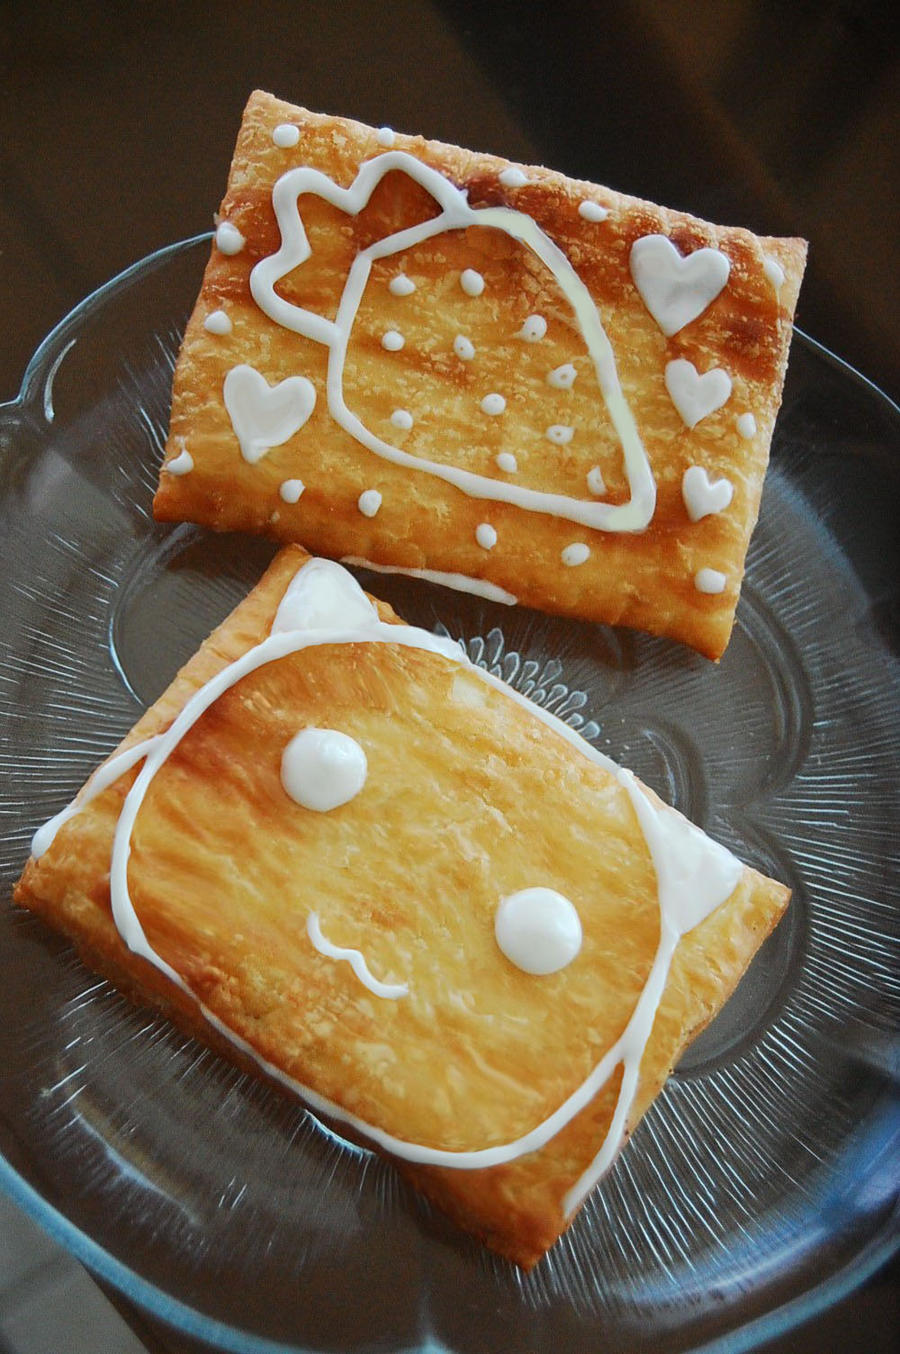 Toaster Strudel Art by PsyckoCinderella